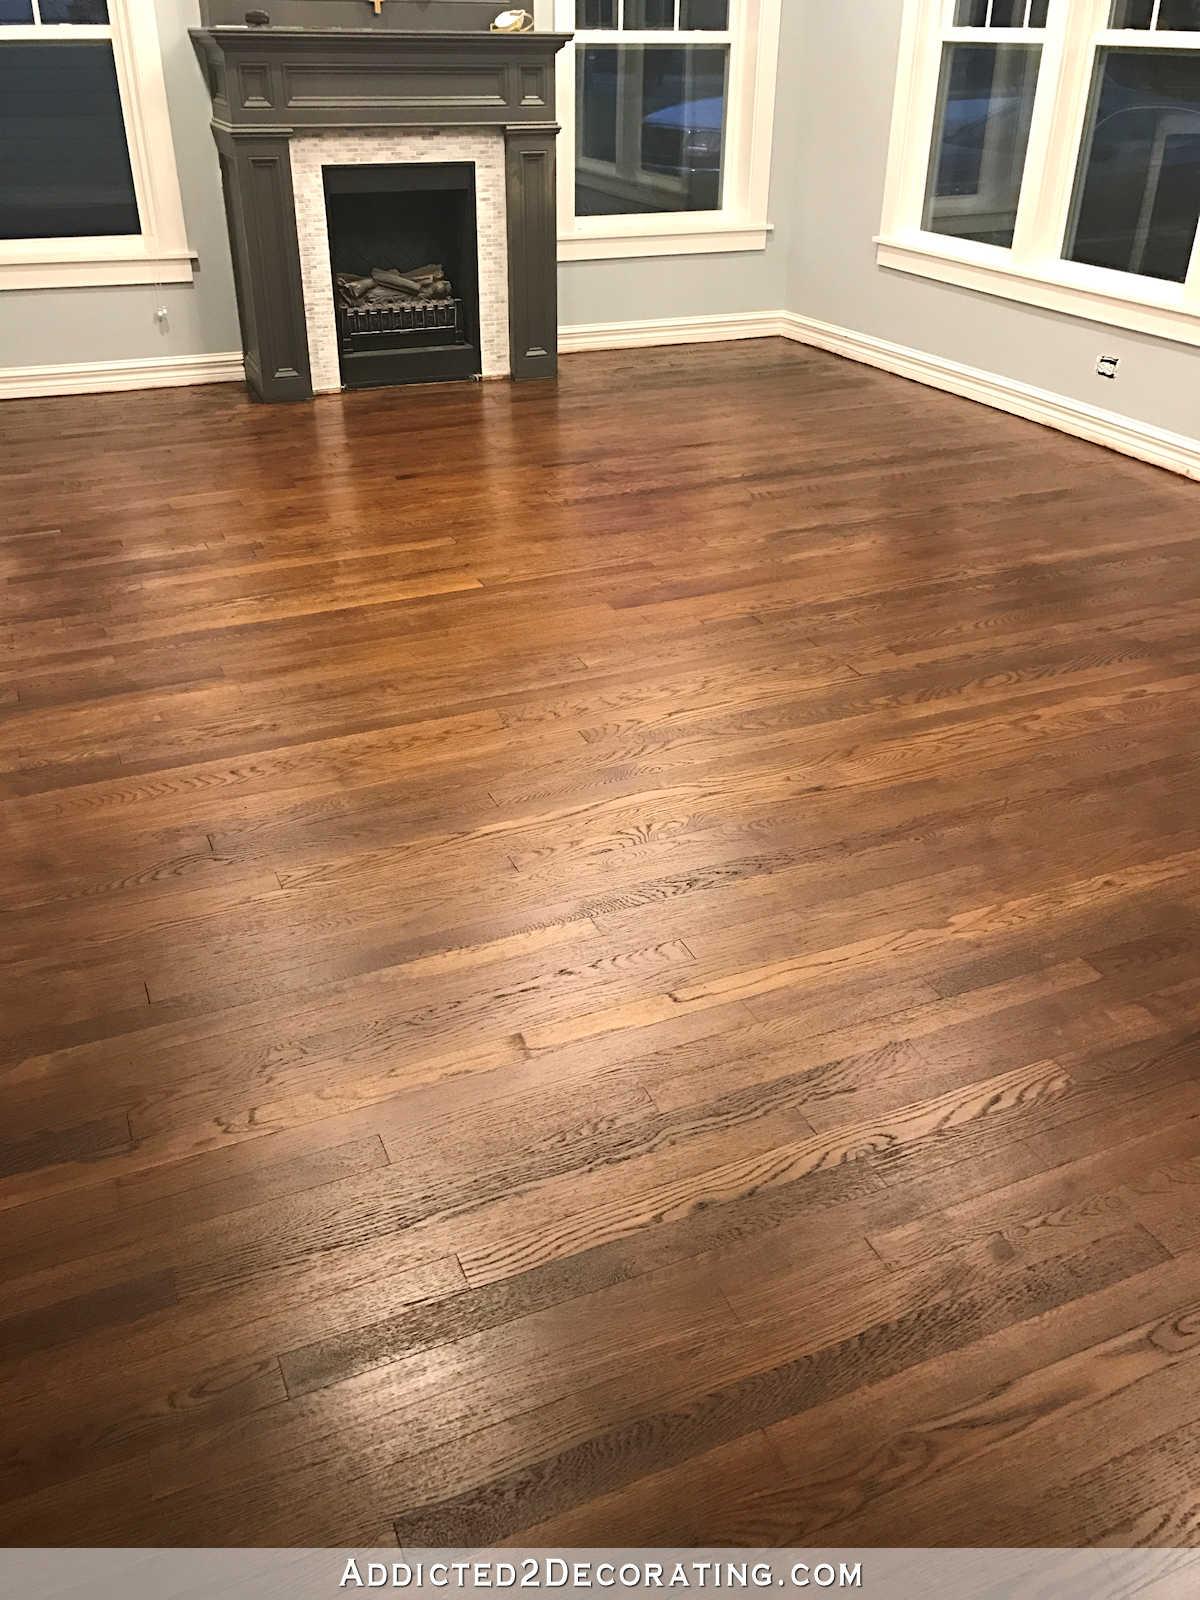 Superfast C Hardwood Flooring  Carpet Vidalondon